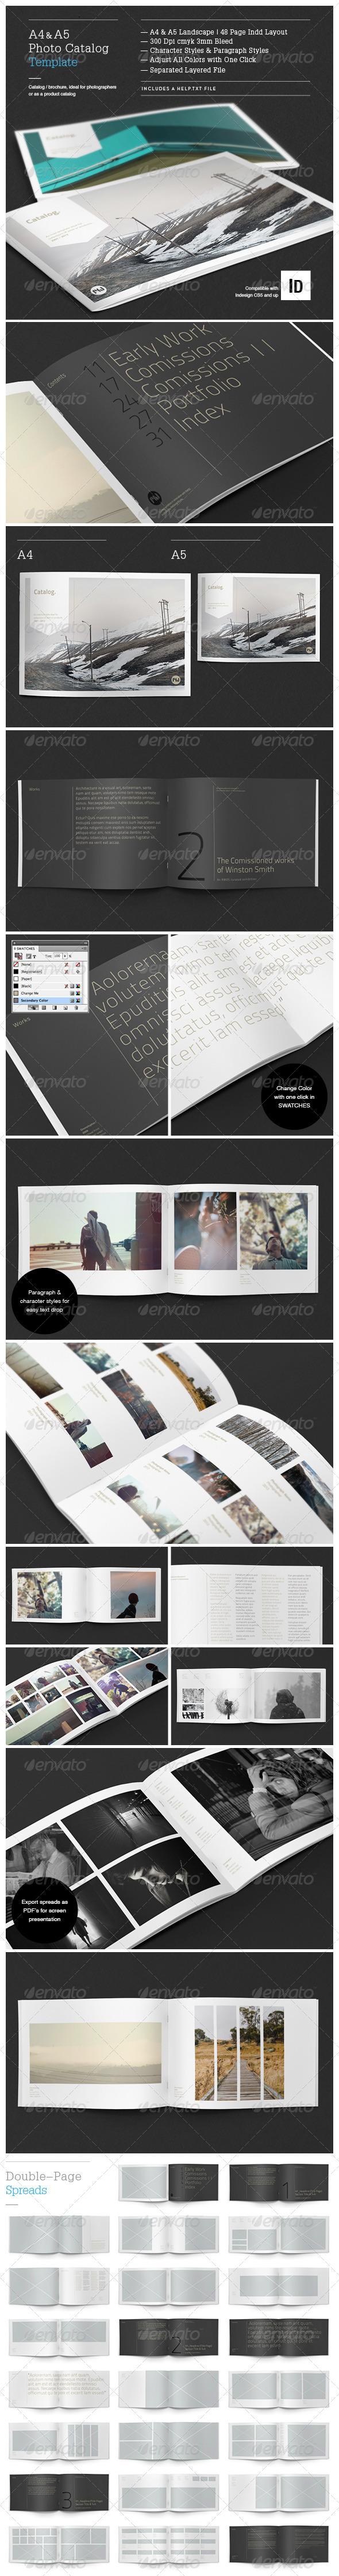 GraphicRiver Minimal Photo Catalog Template 4143498